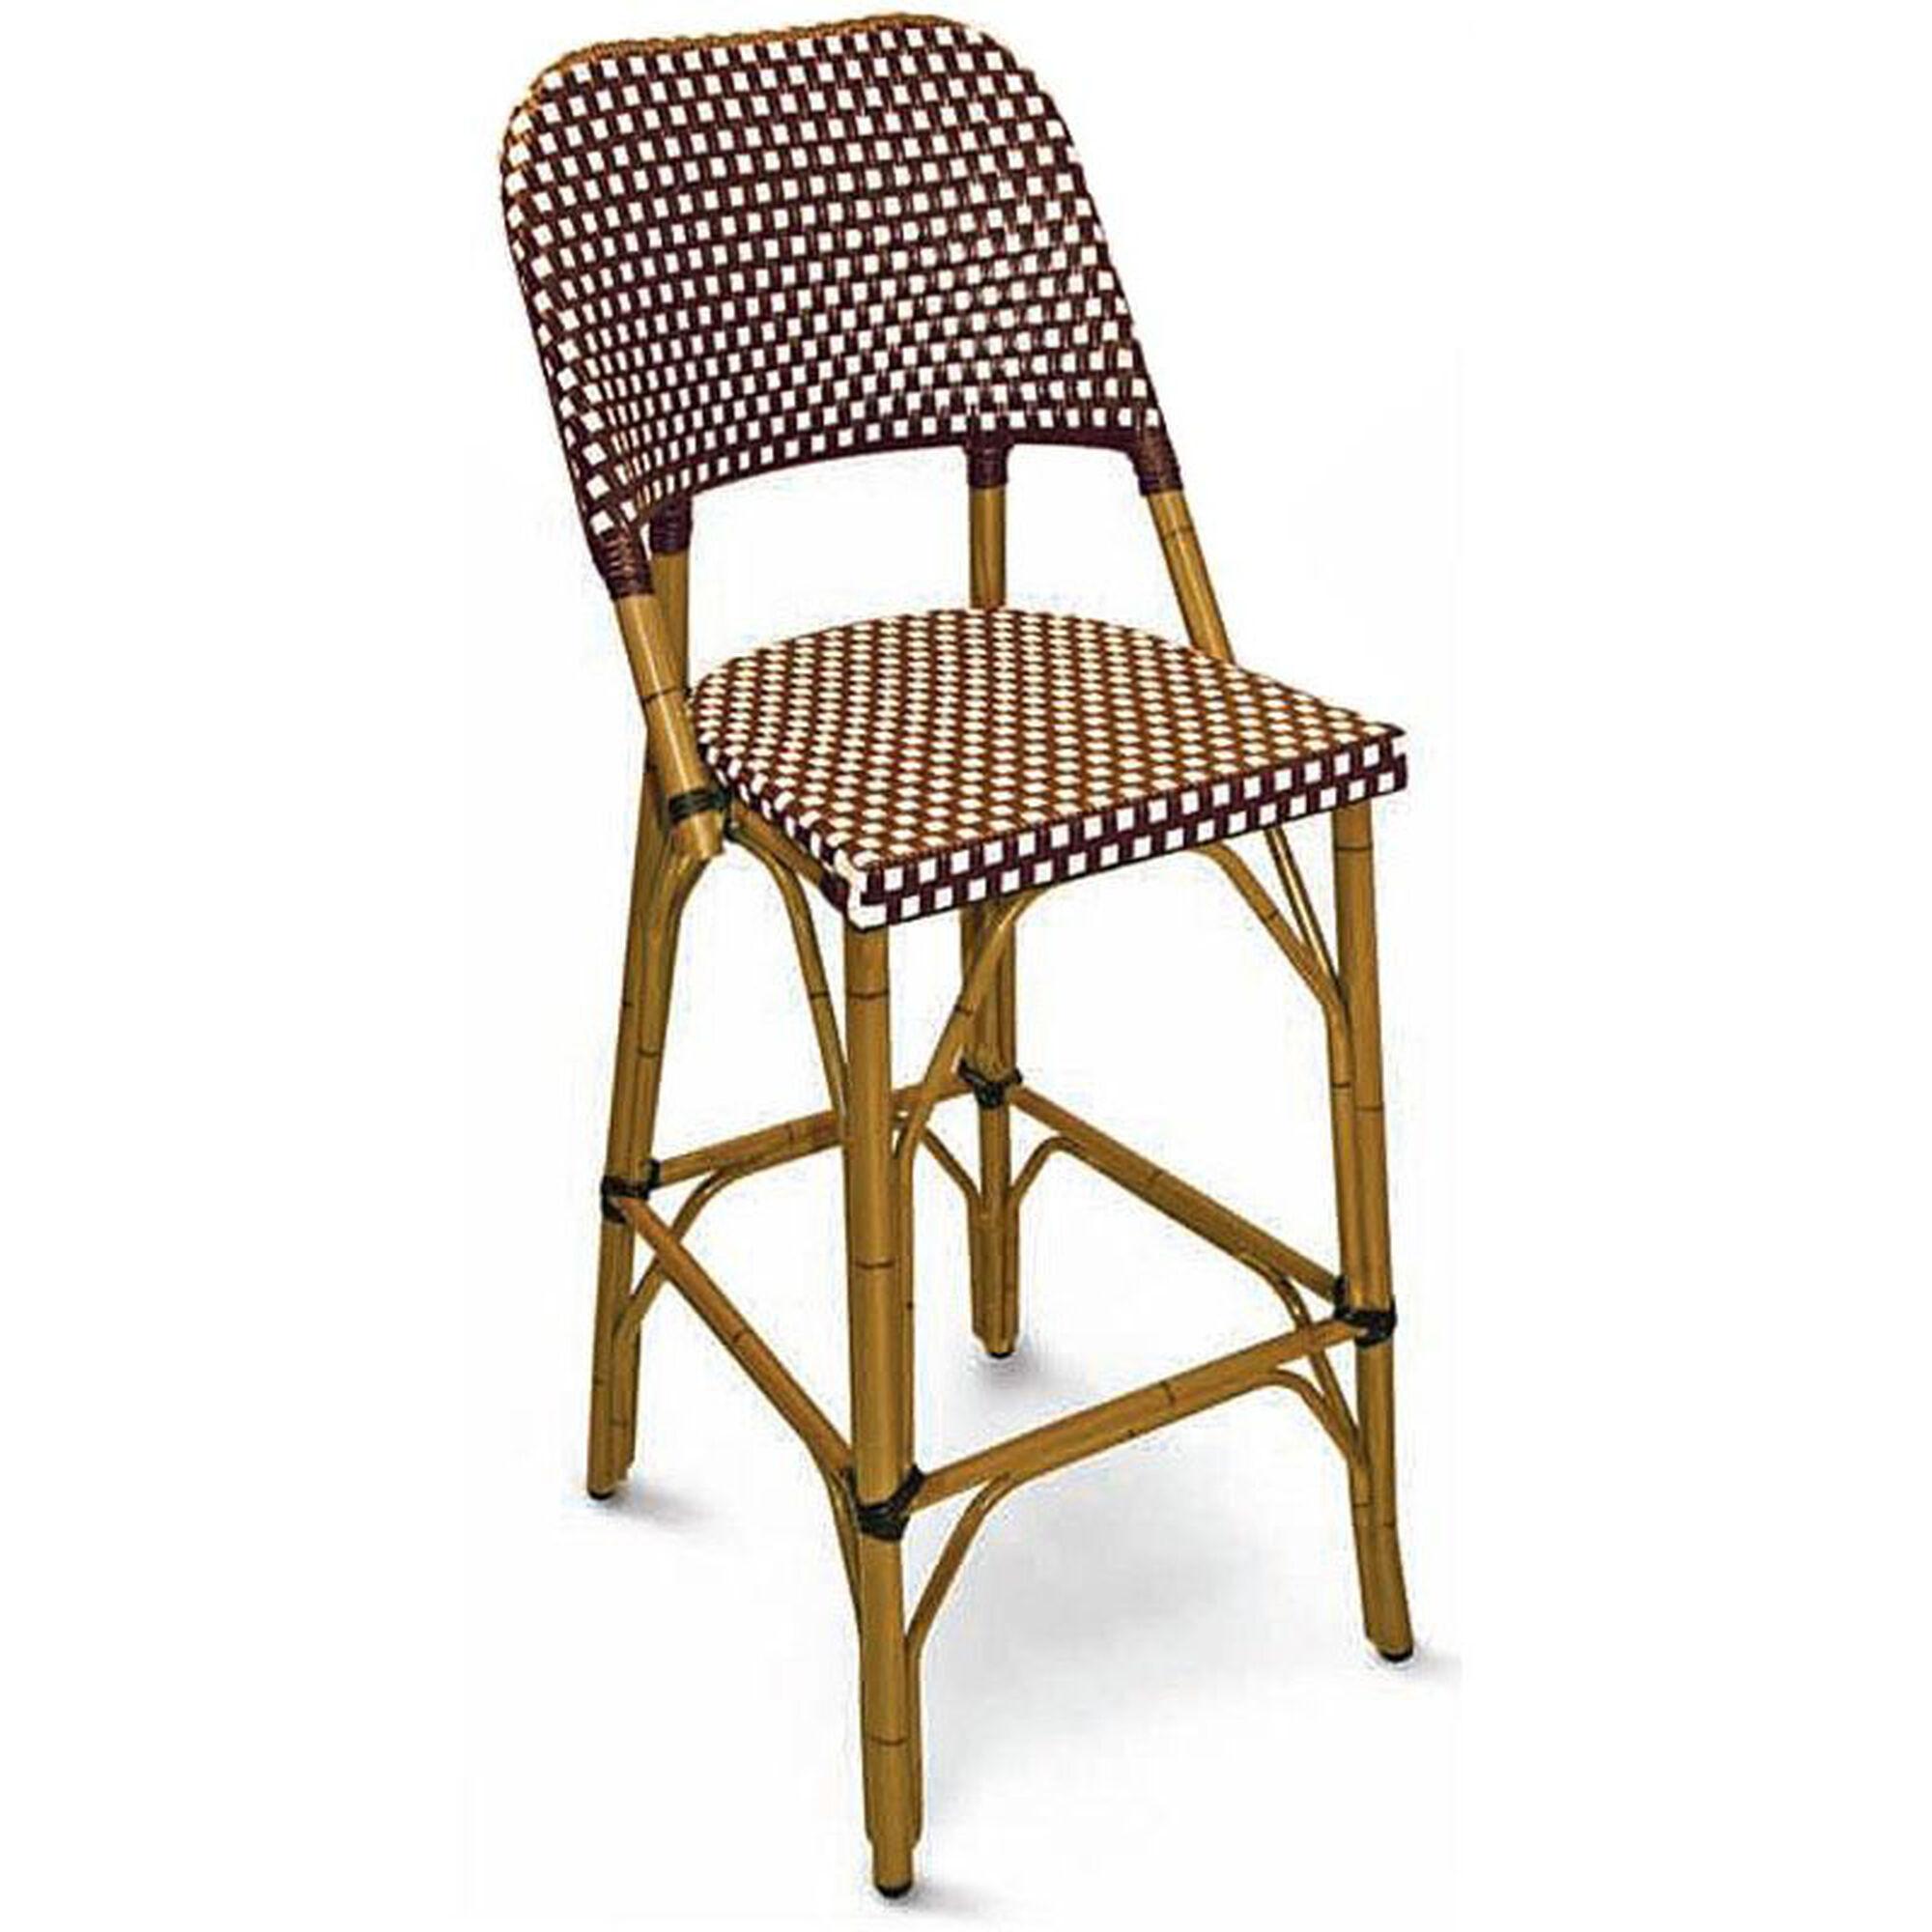 Outdoor Armless Barstool Rattan Brt 01 Churchchairs4less Com